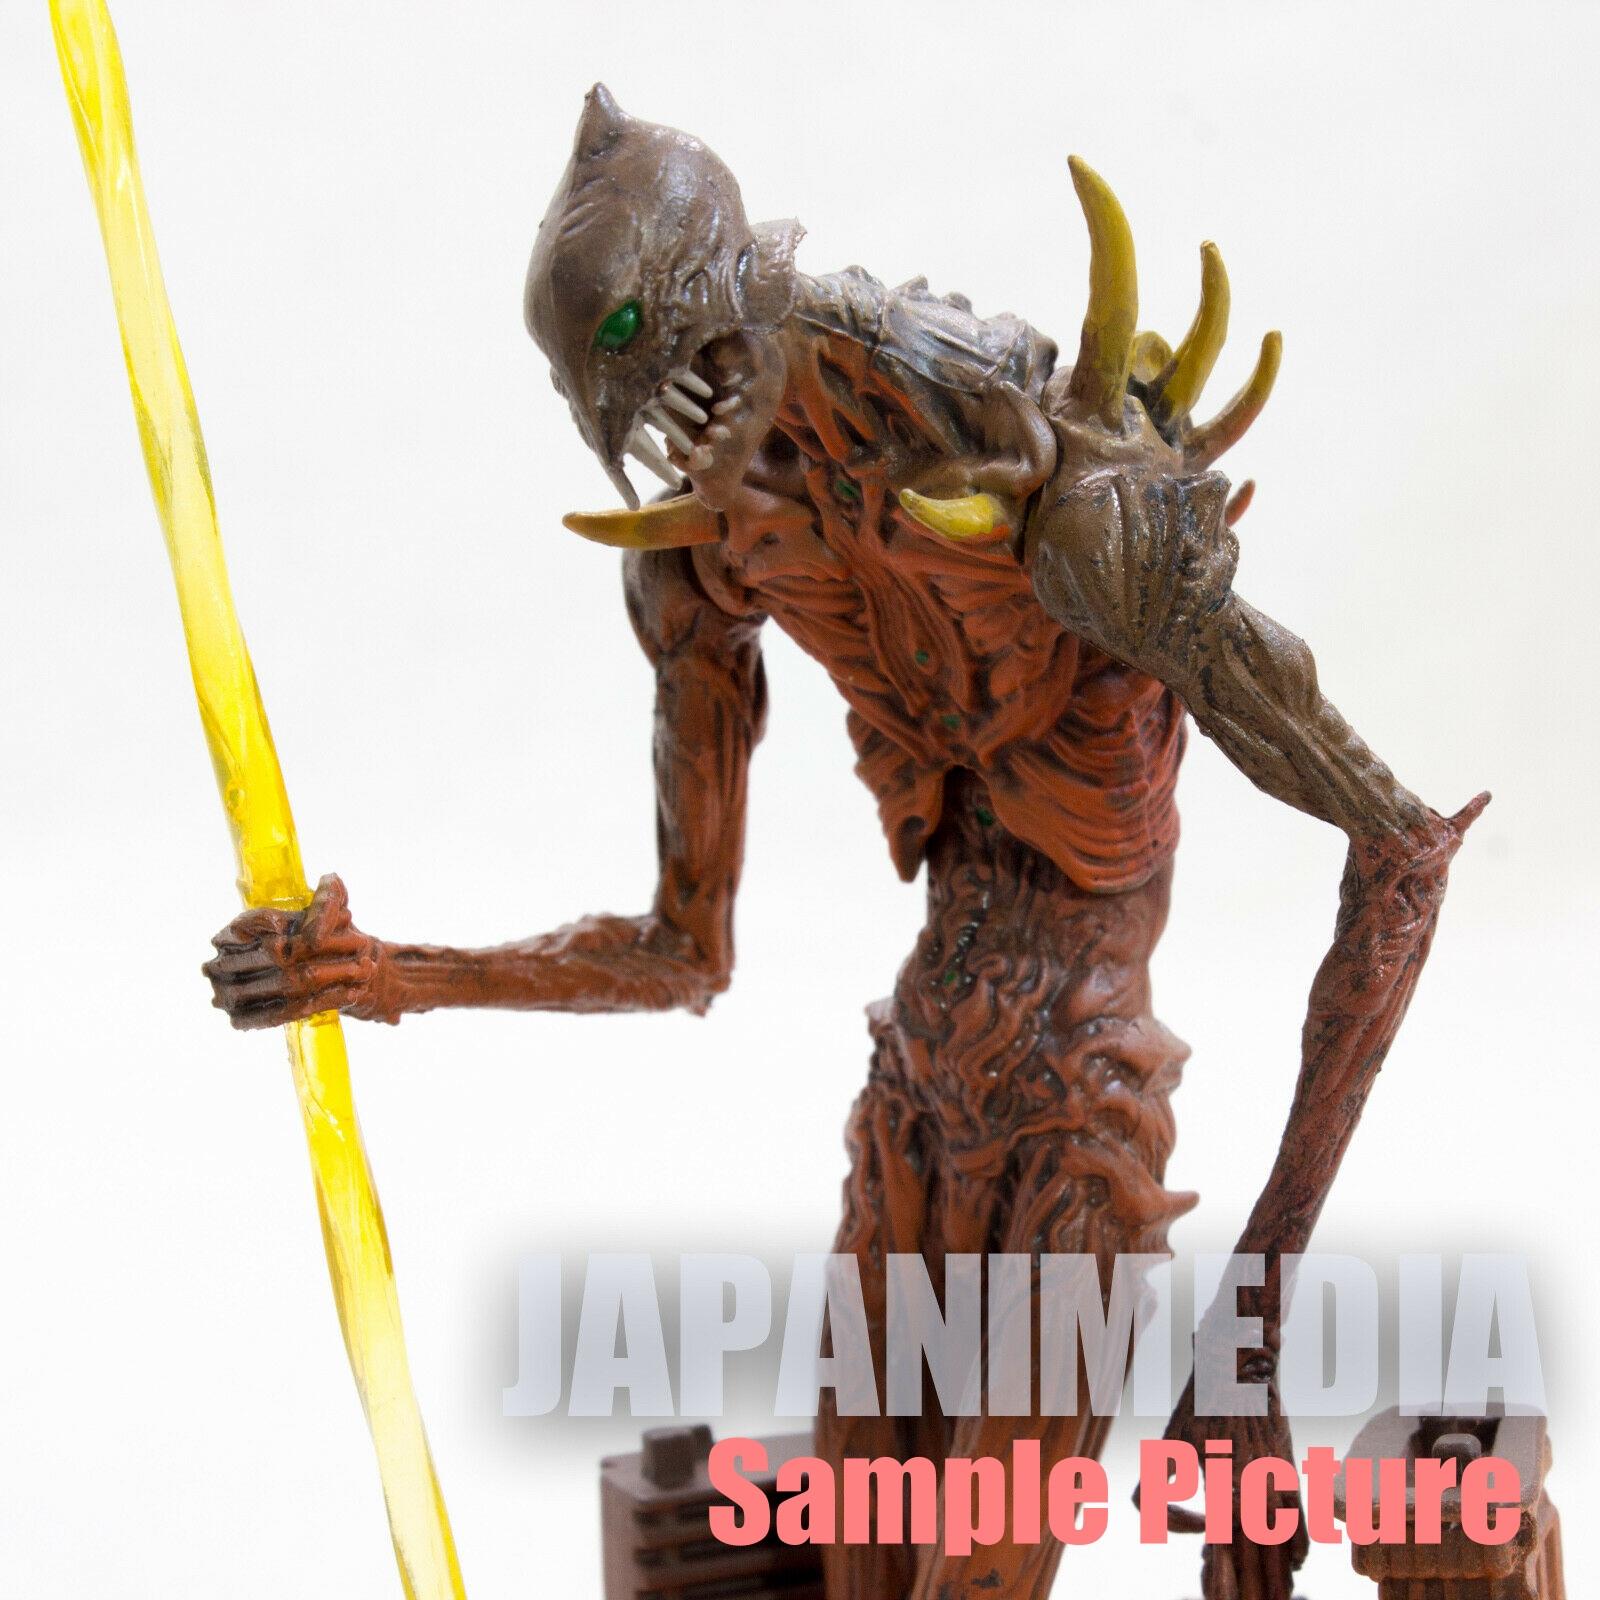 RARE Giant God Warrior Appears in Tokyo Mini Figure JAPAN EVANGELION NAUSICAA 2